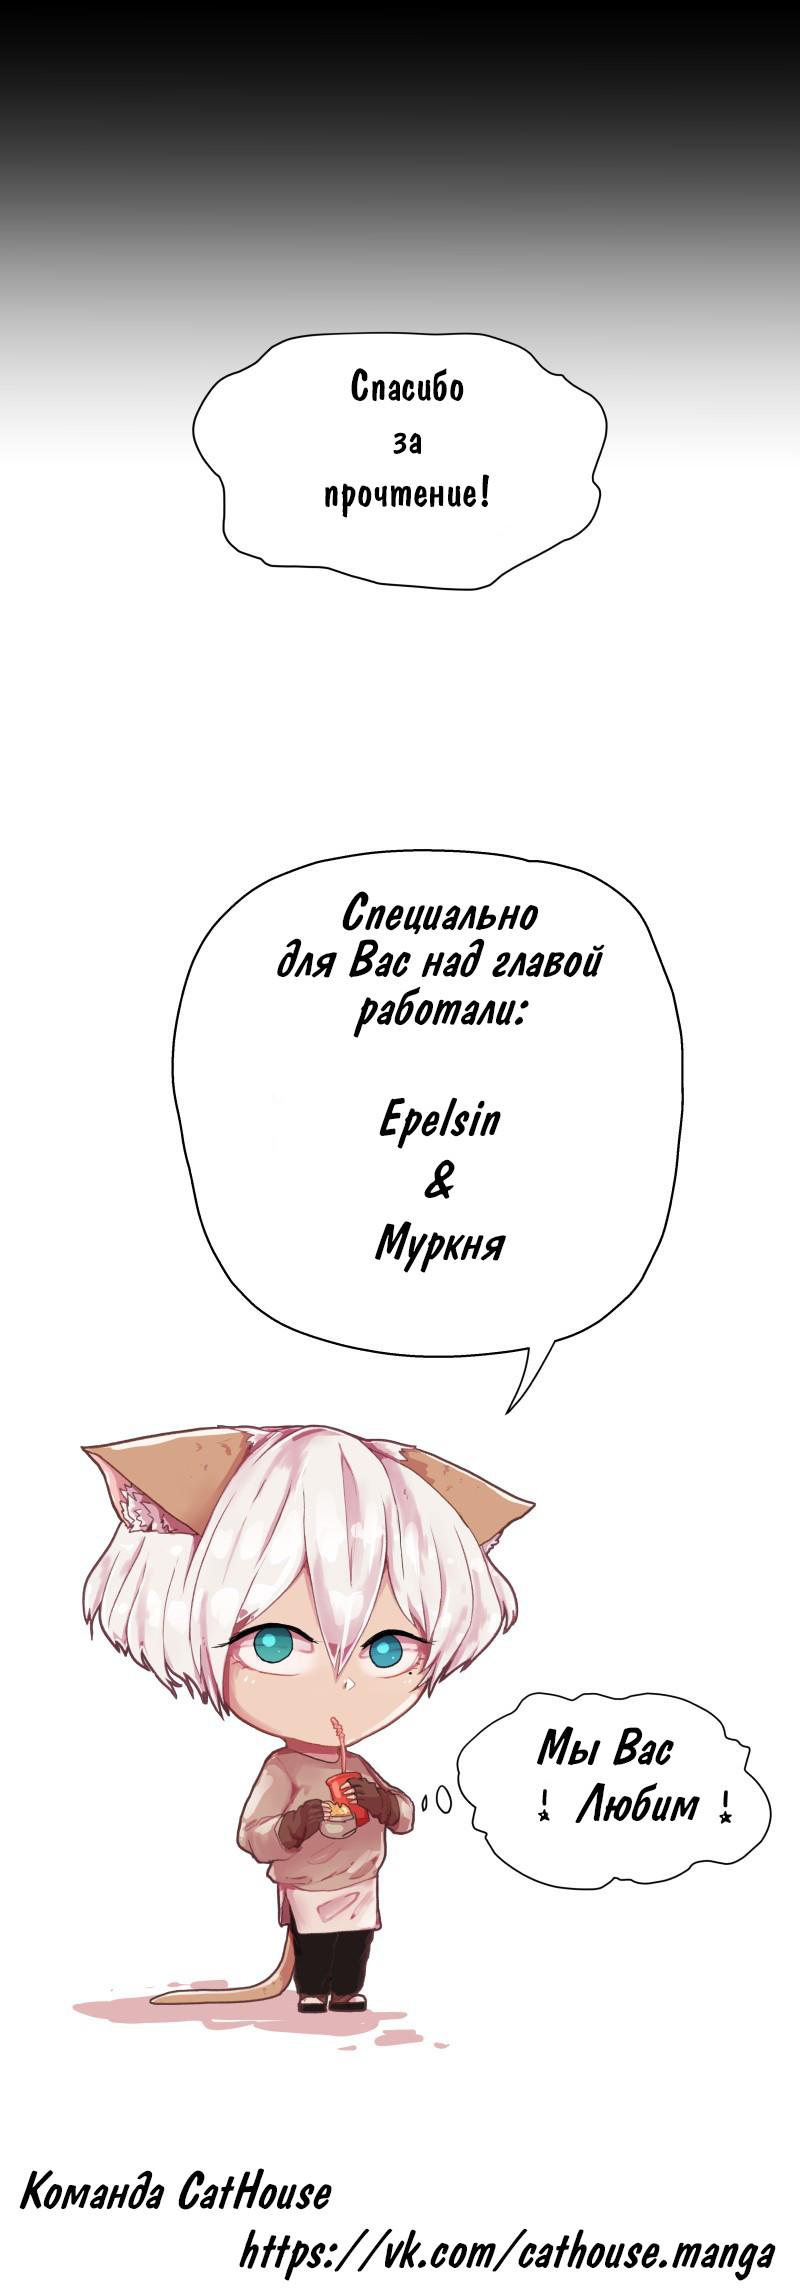 https://r1.ninemanga.com/comics/pic2/58/31802/314463/1481916738619.jpg Page 7